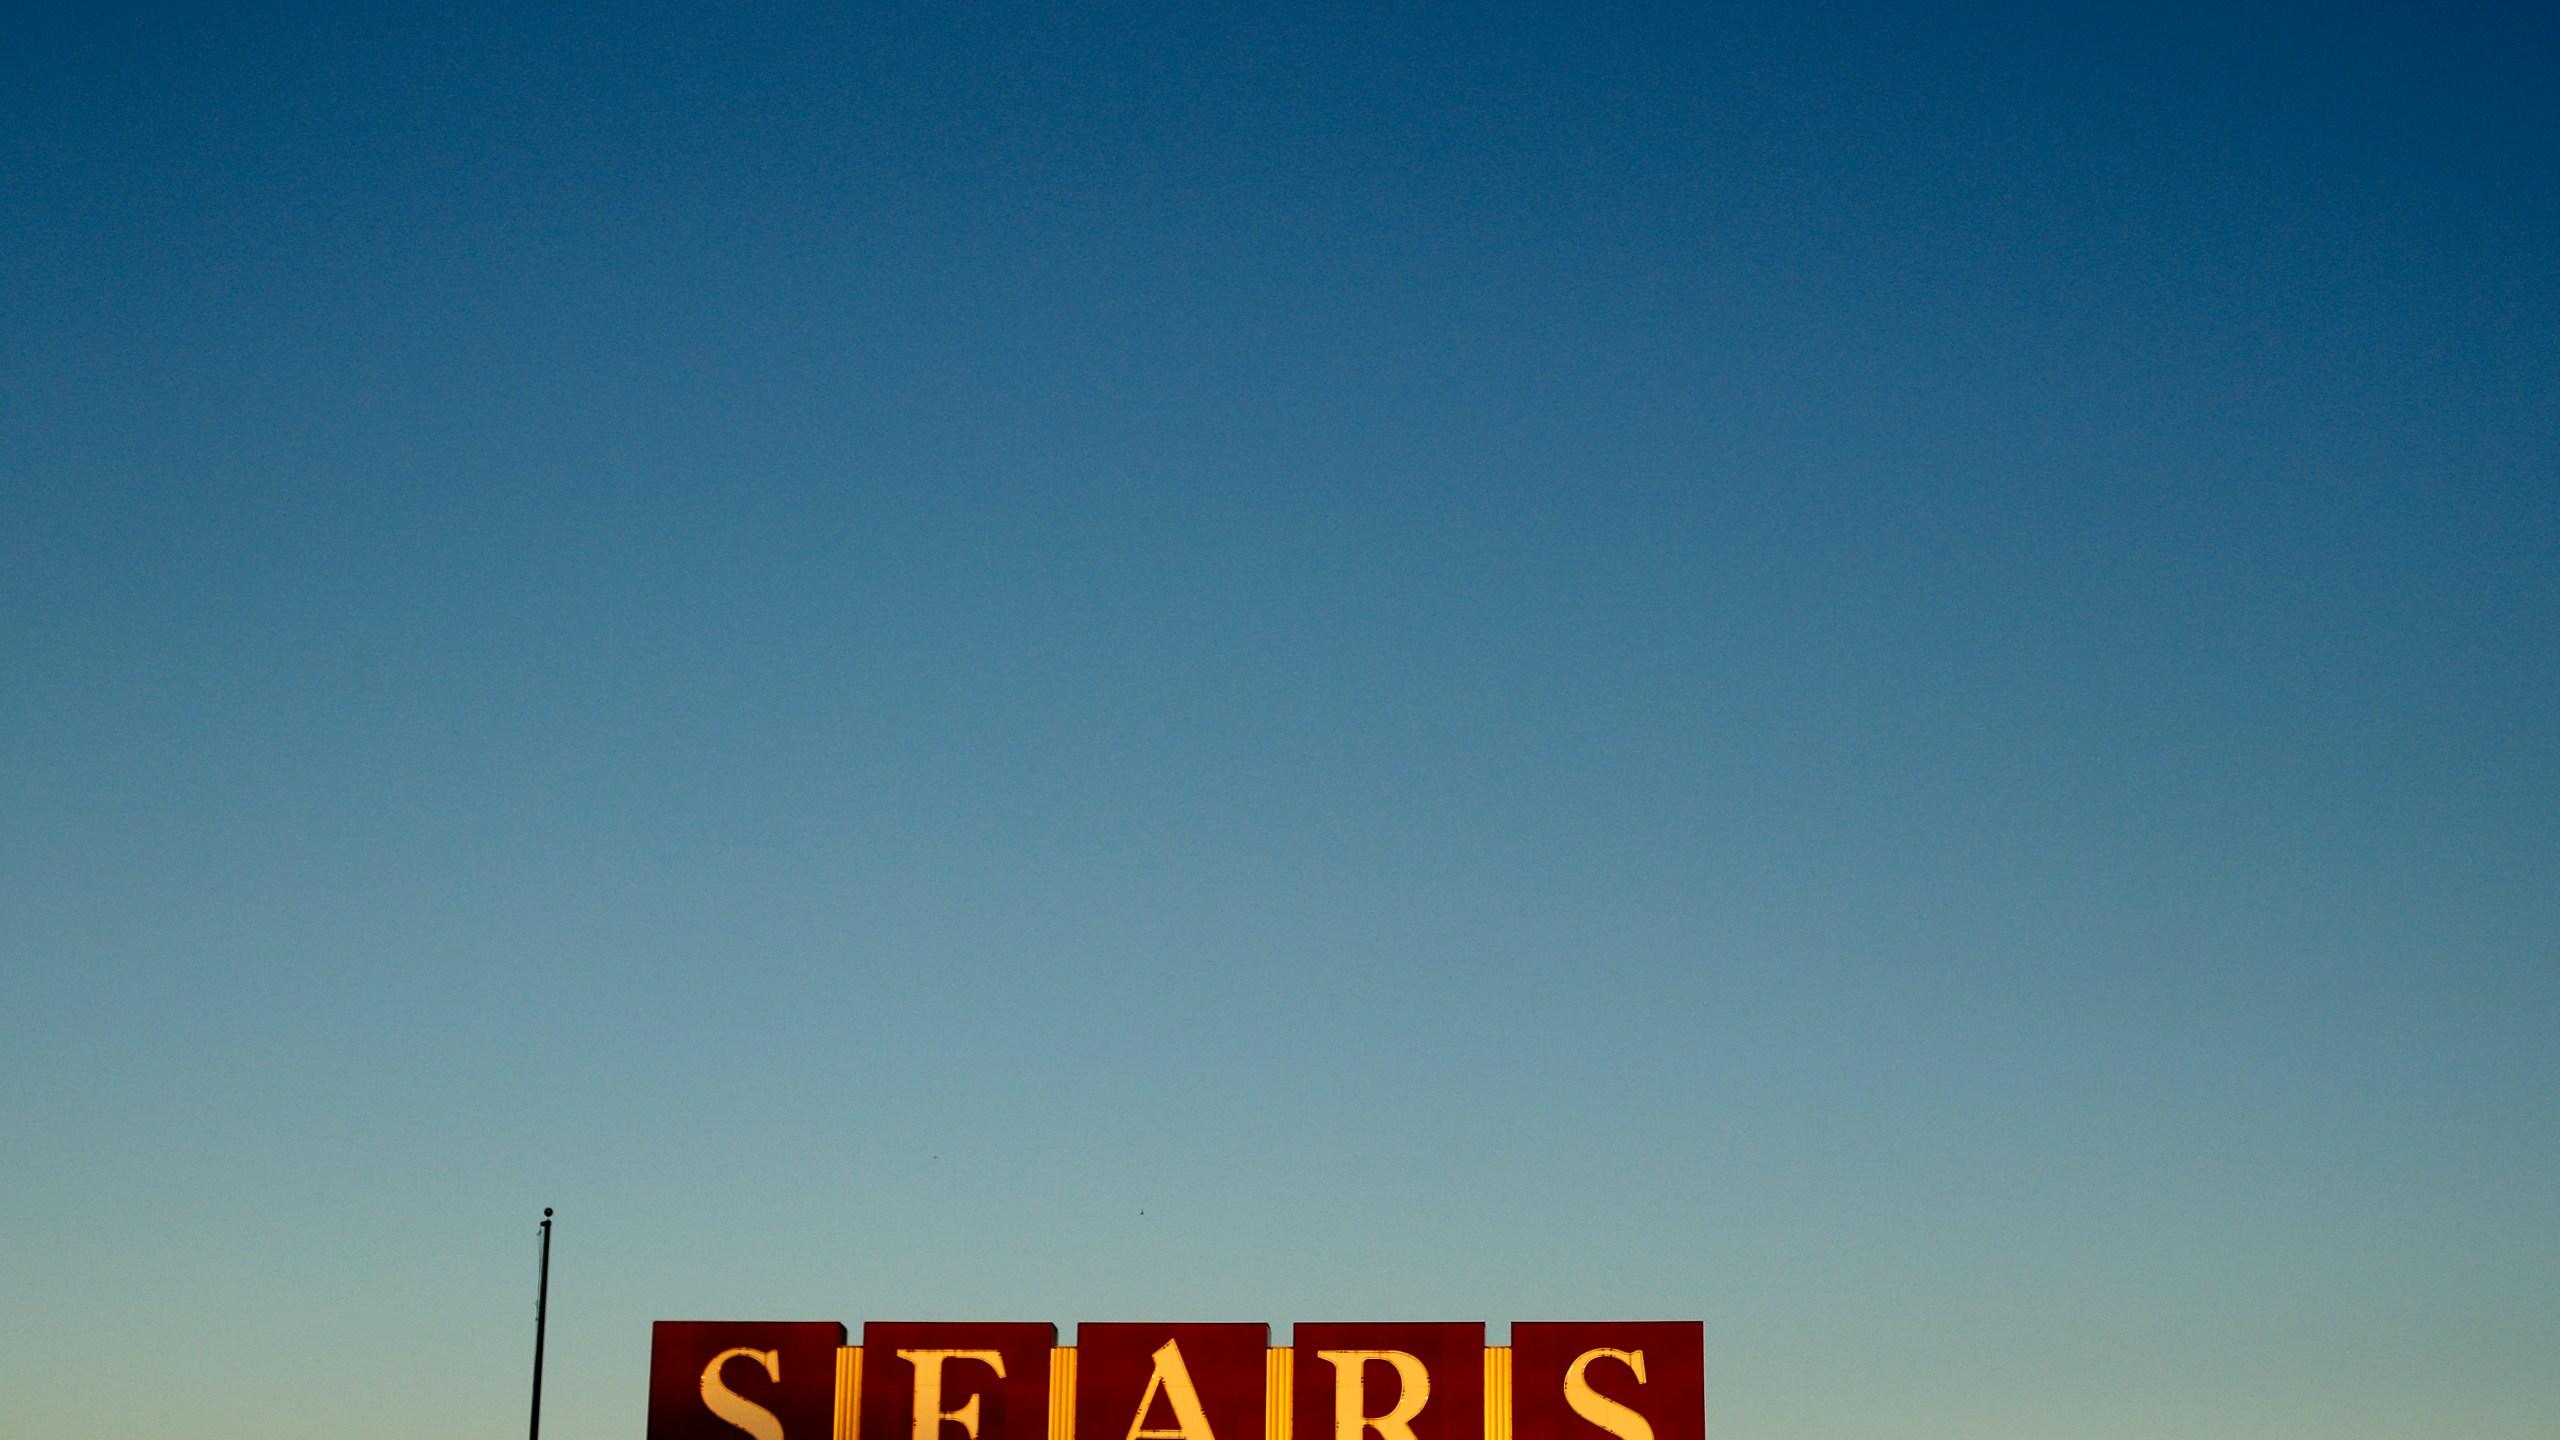 Sears_Suppliers_66137-159532.jpg93890311